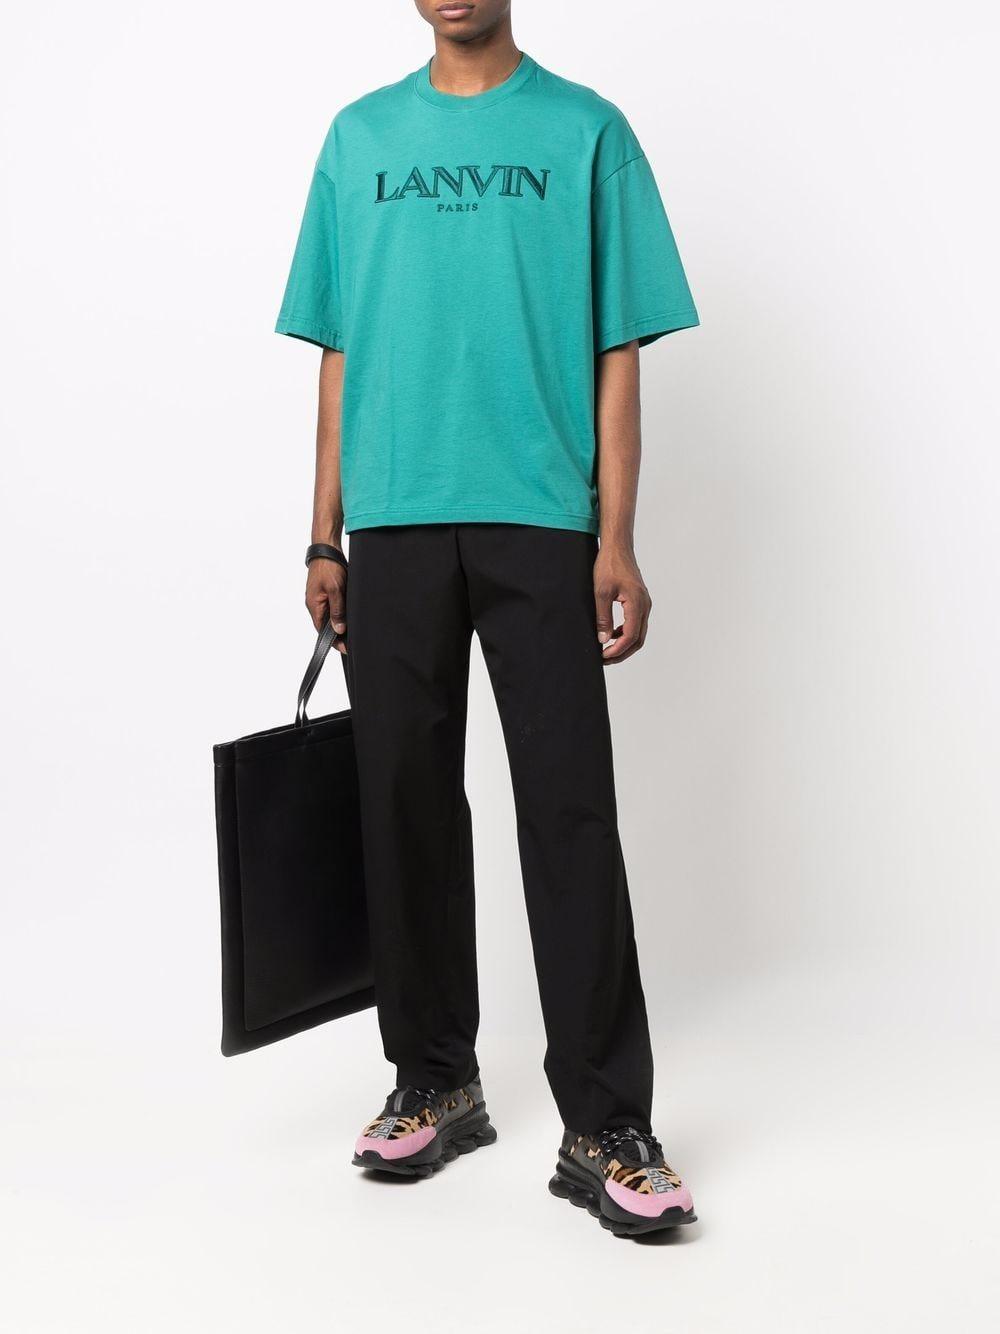 oversize t-shirt man in cotton LANVIN | T-shirts | RM-TS0009-J007-A21280